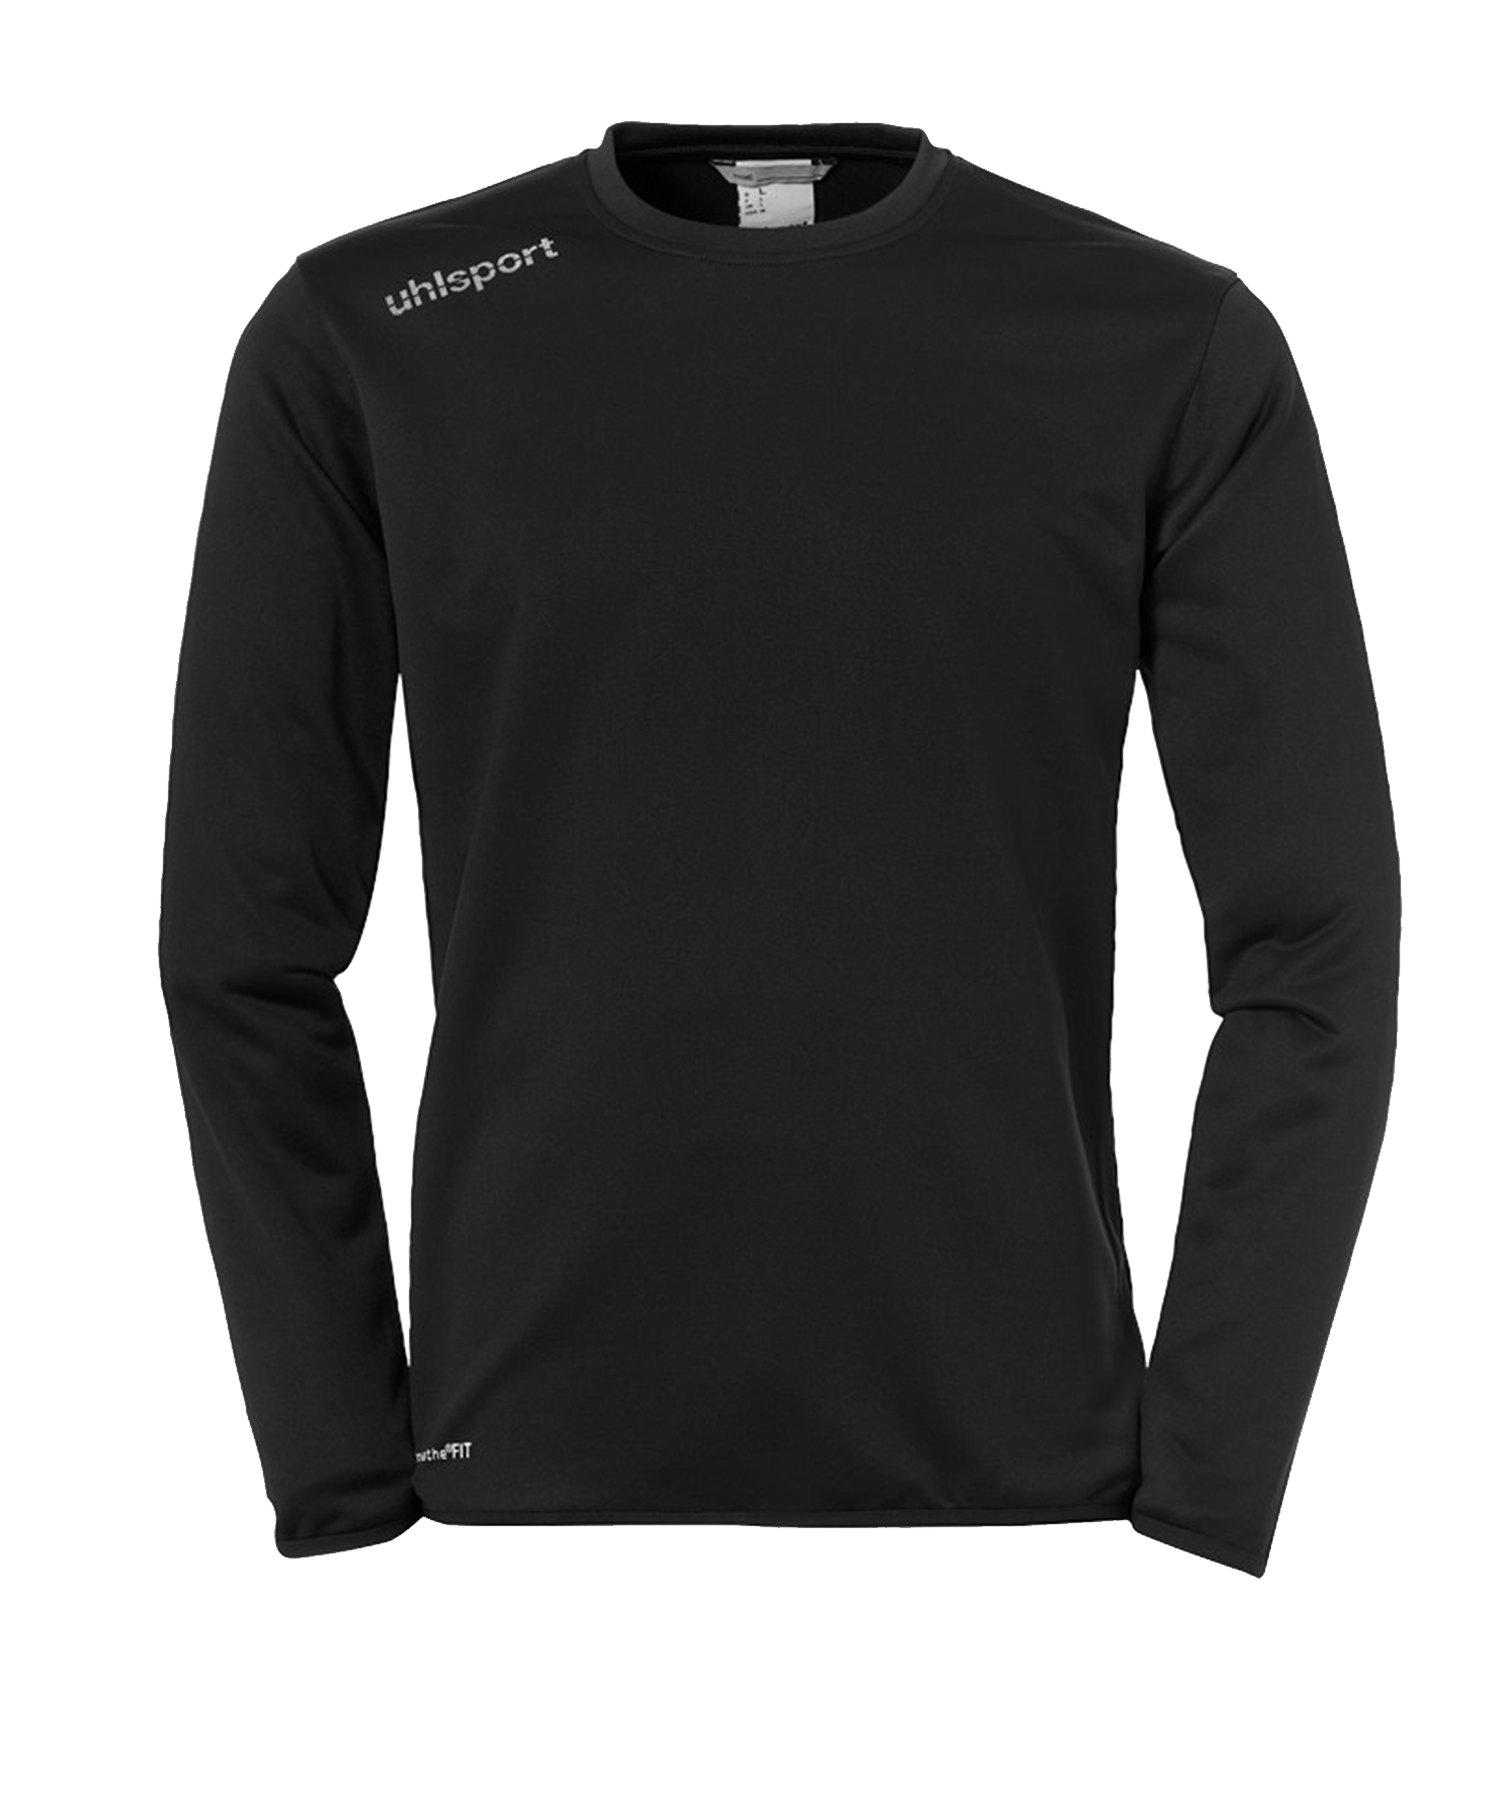 Uhlsport Essential Trainingstop langarm F01 - Schwarz